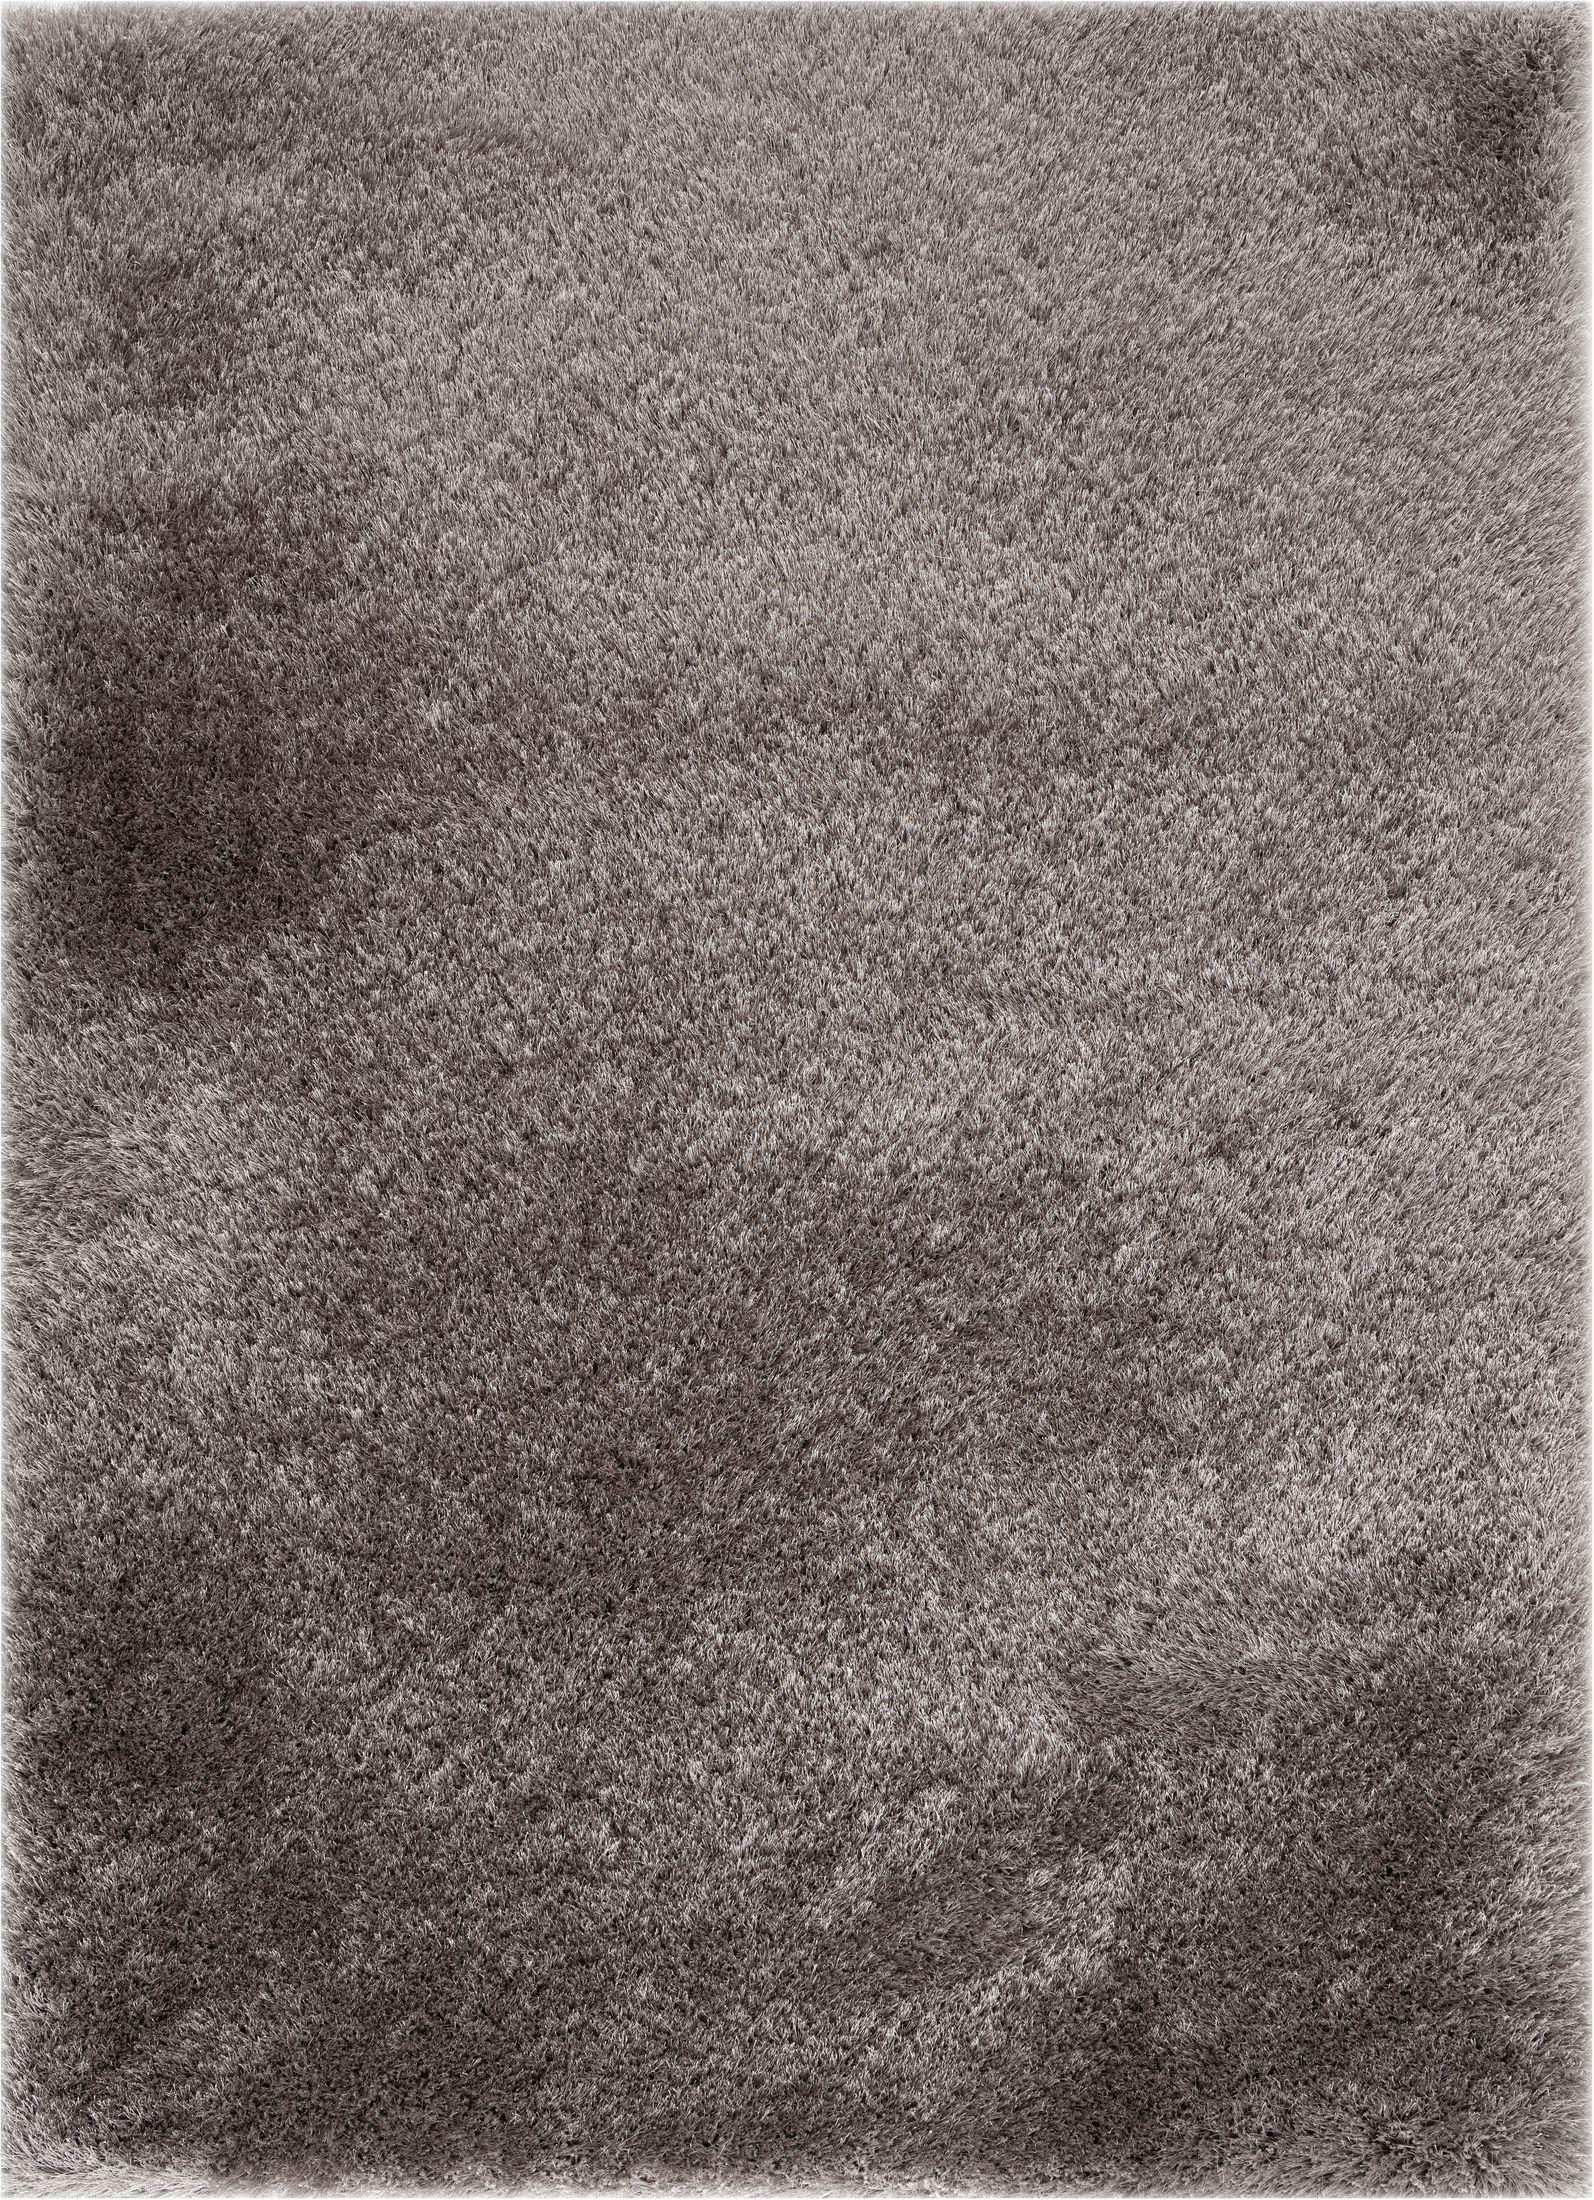 Rugs - Zanca Area Rug - Gray